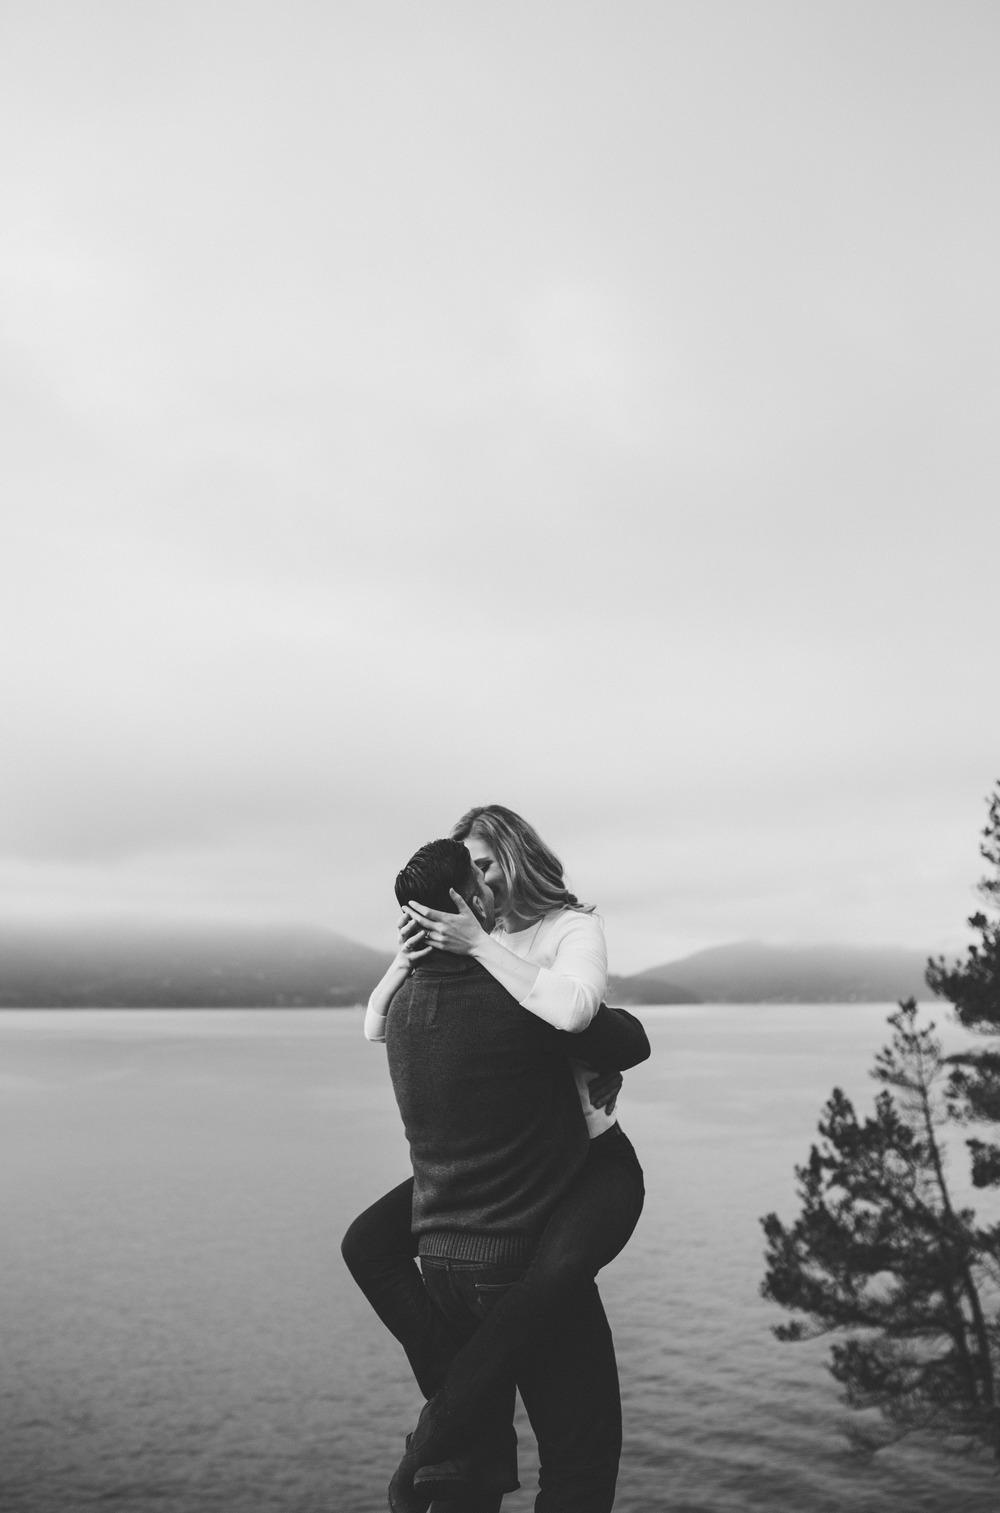 IMG_4398 JENNIFER PICARD PHOTOGRAPHY VANCOUVER WEDDING PHOTOGRAPHER.jpg